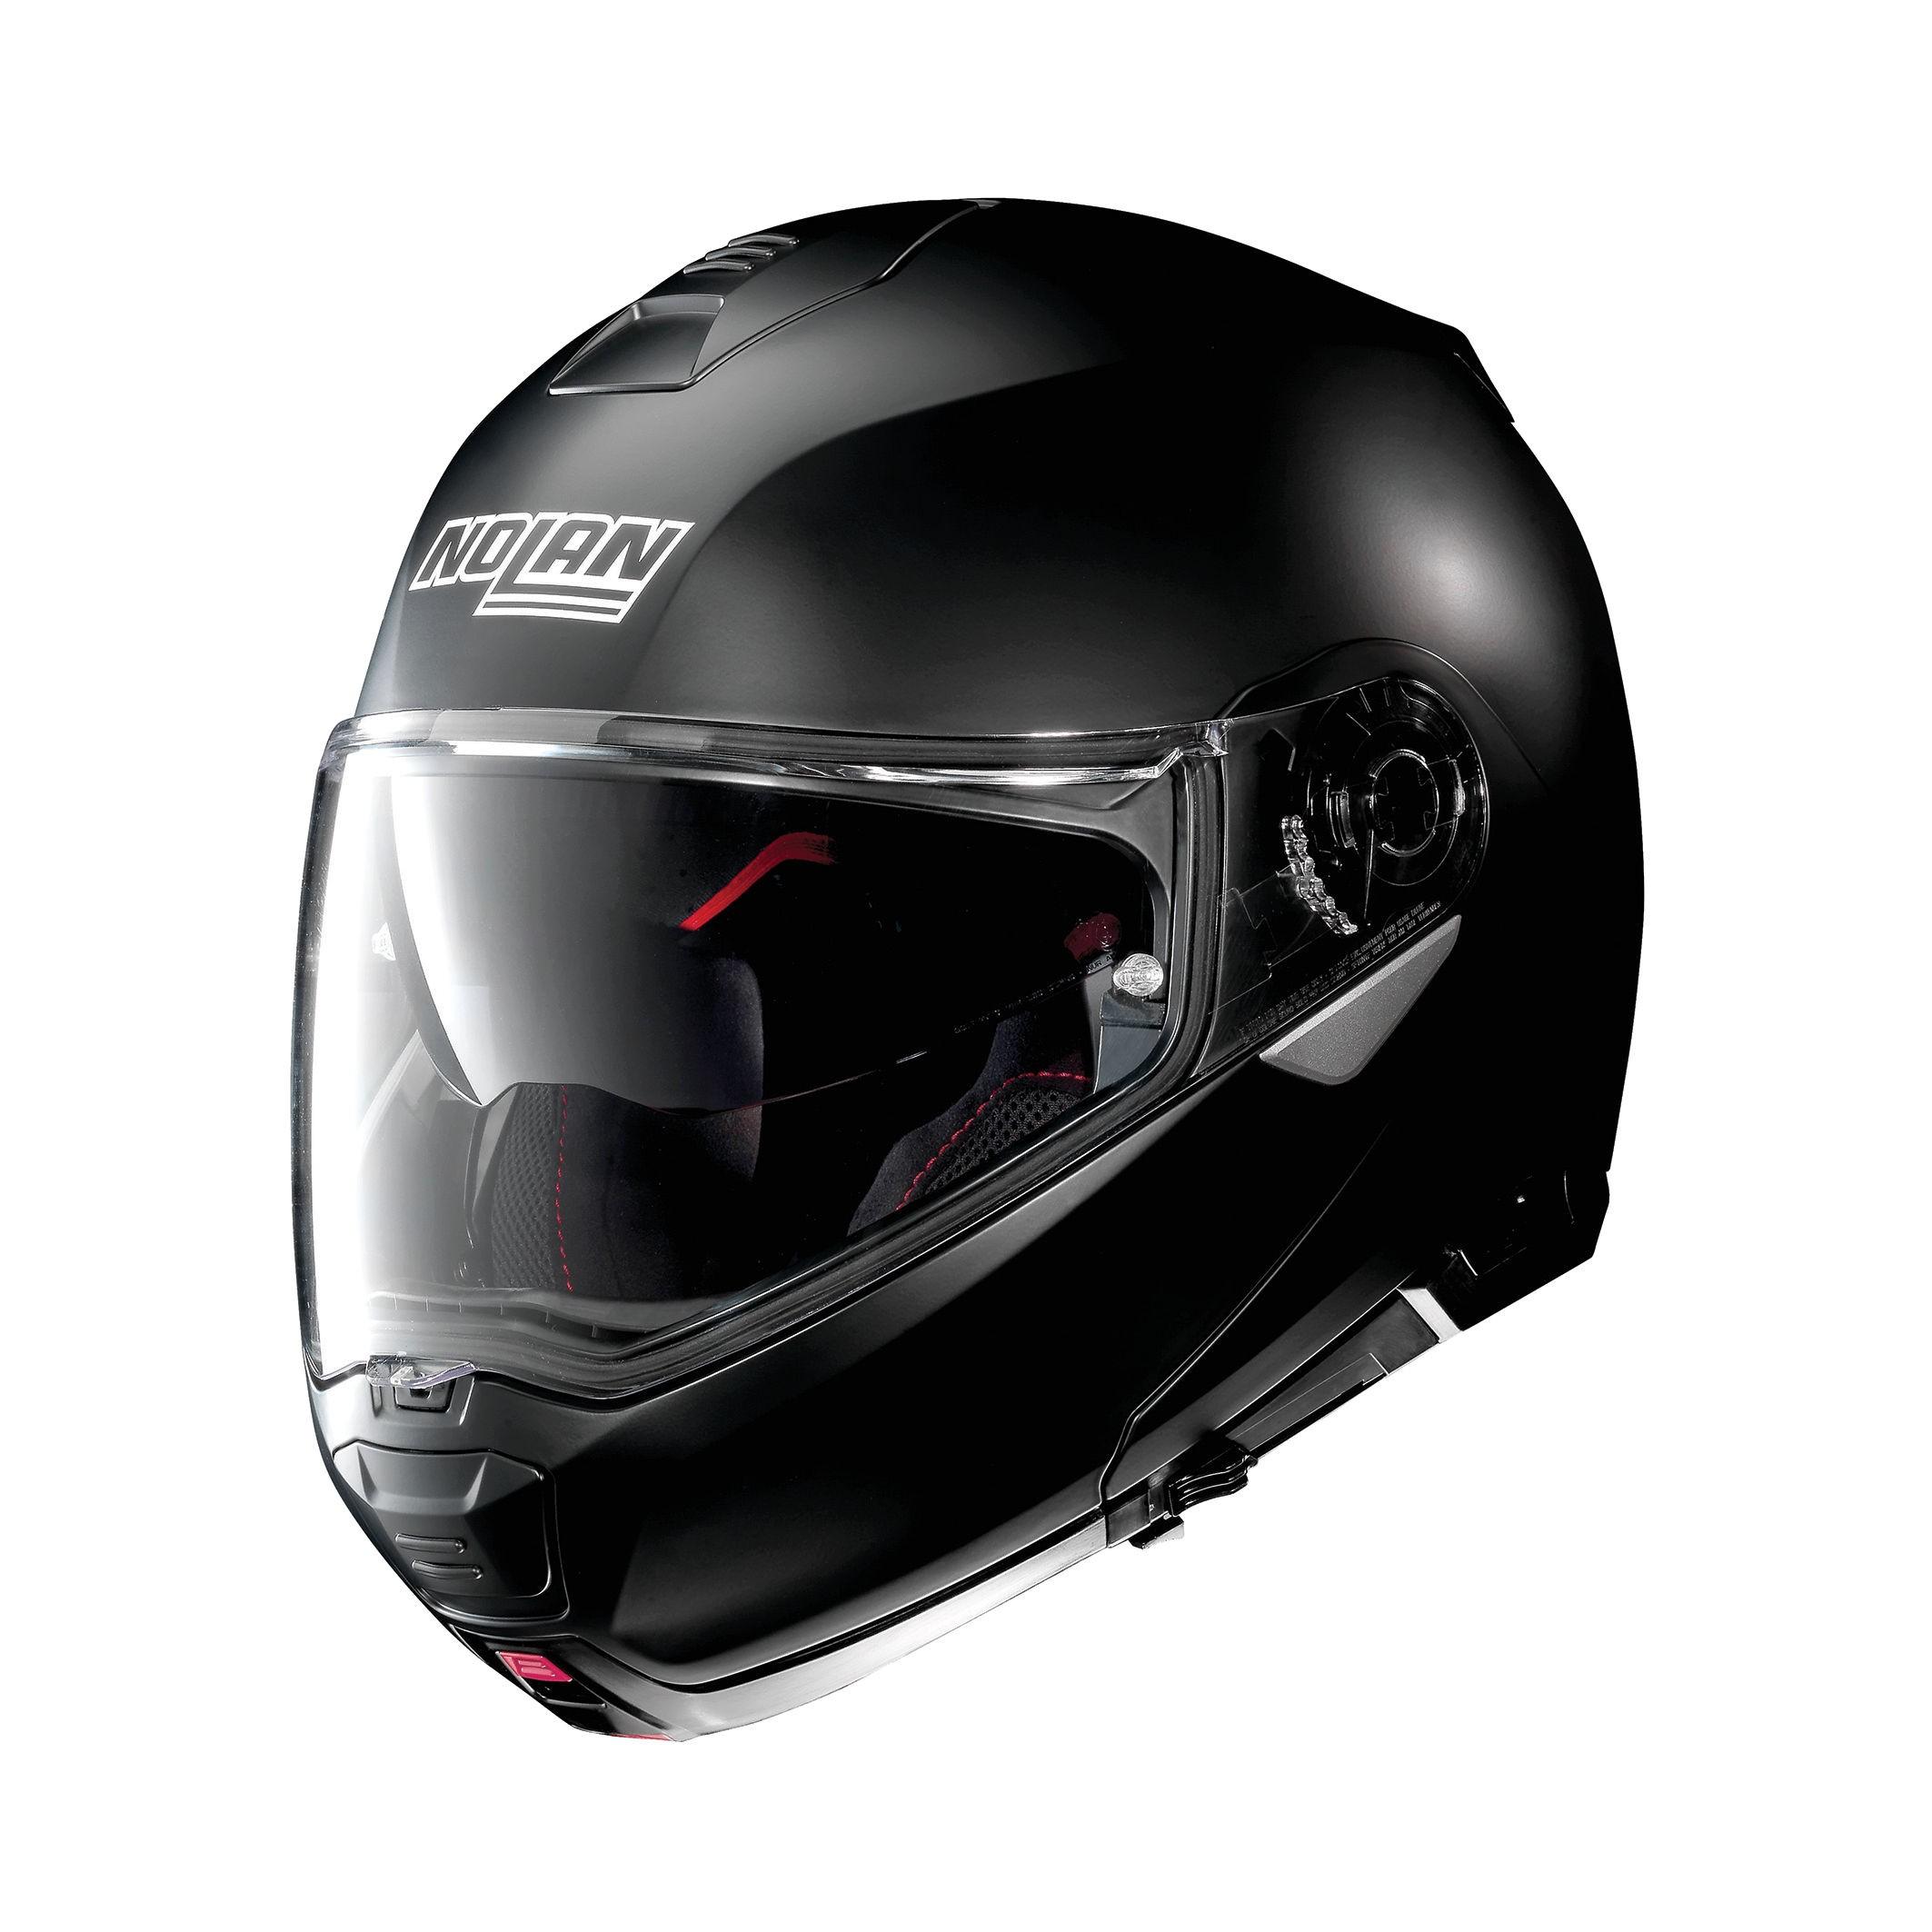 Moto helma Nolan N100-5 Classic N-Com Flat Black 10